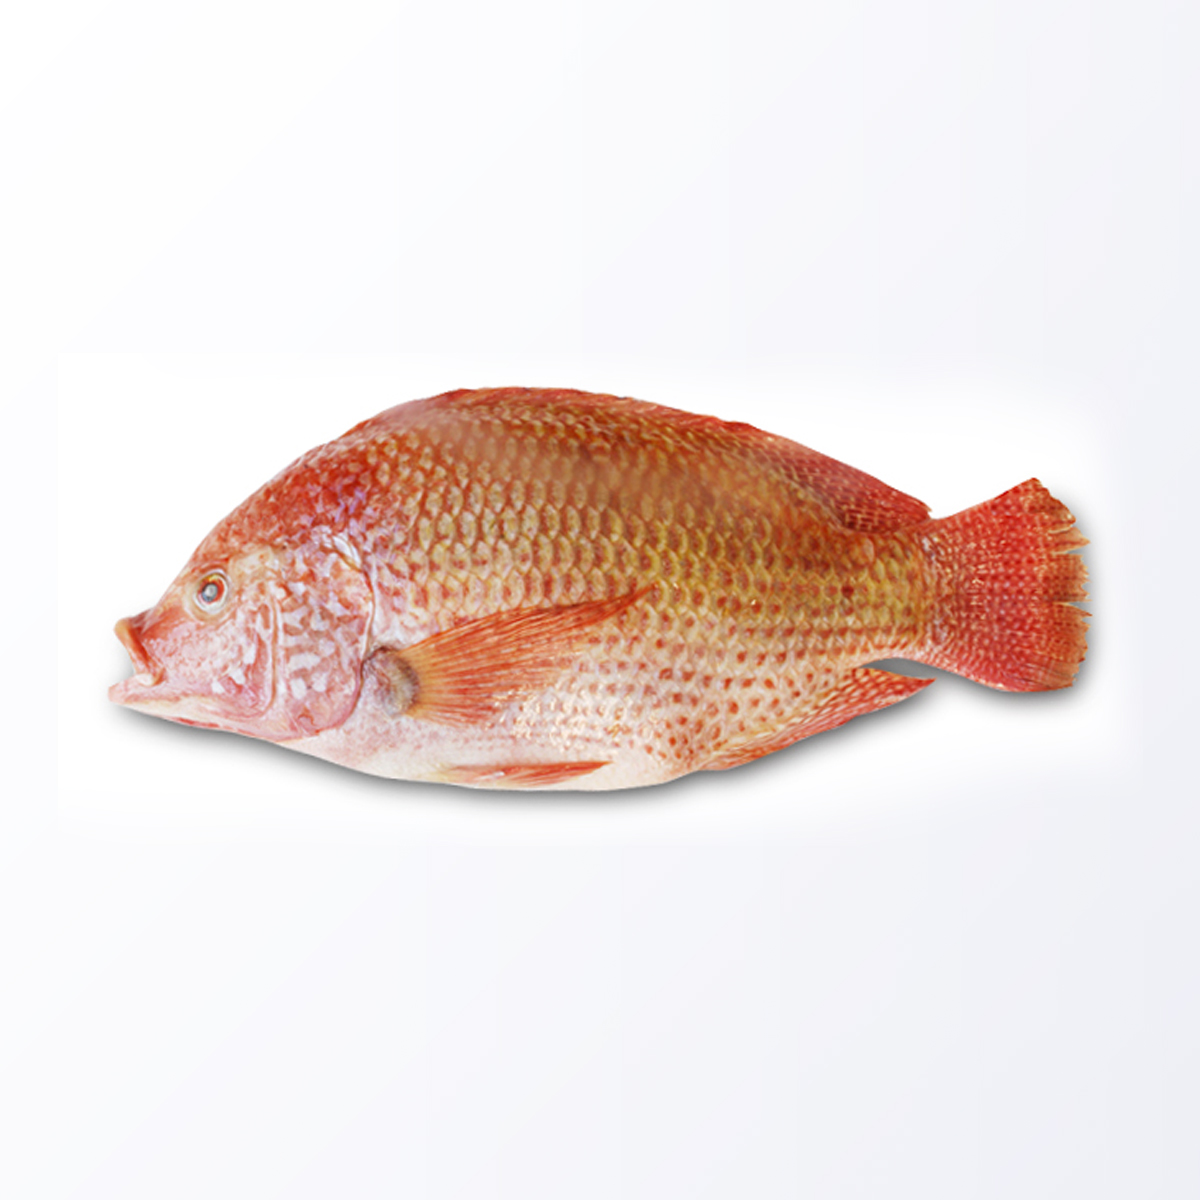 TLP156-Tilapia-Red.jpg